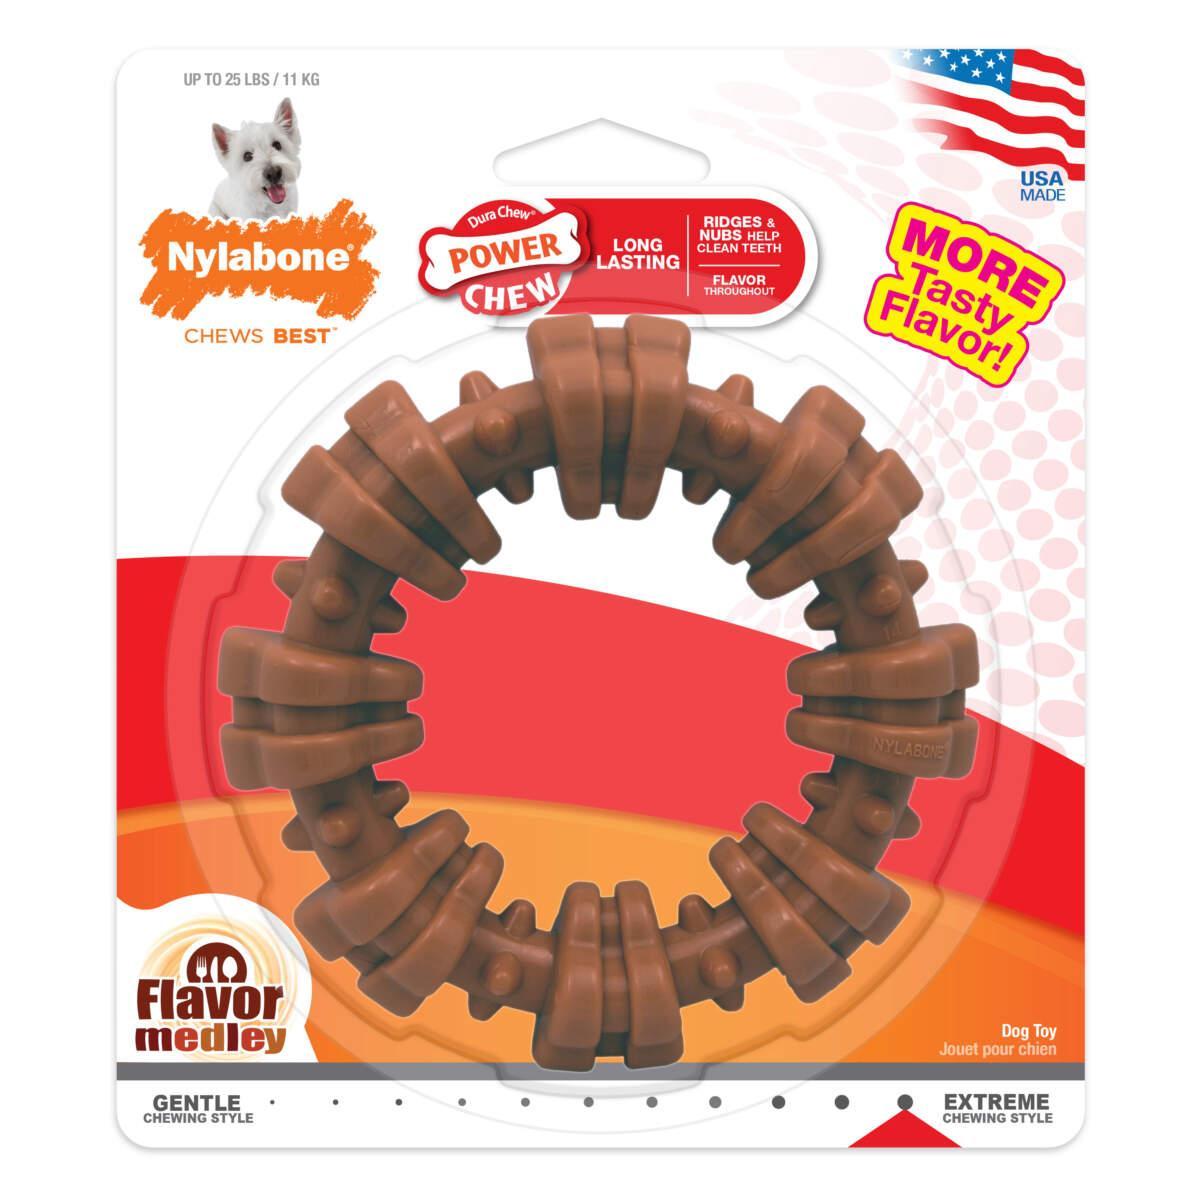 Nylabone Power Chew Textured Ring Medley Flavored Dog Toy, Regular